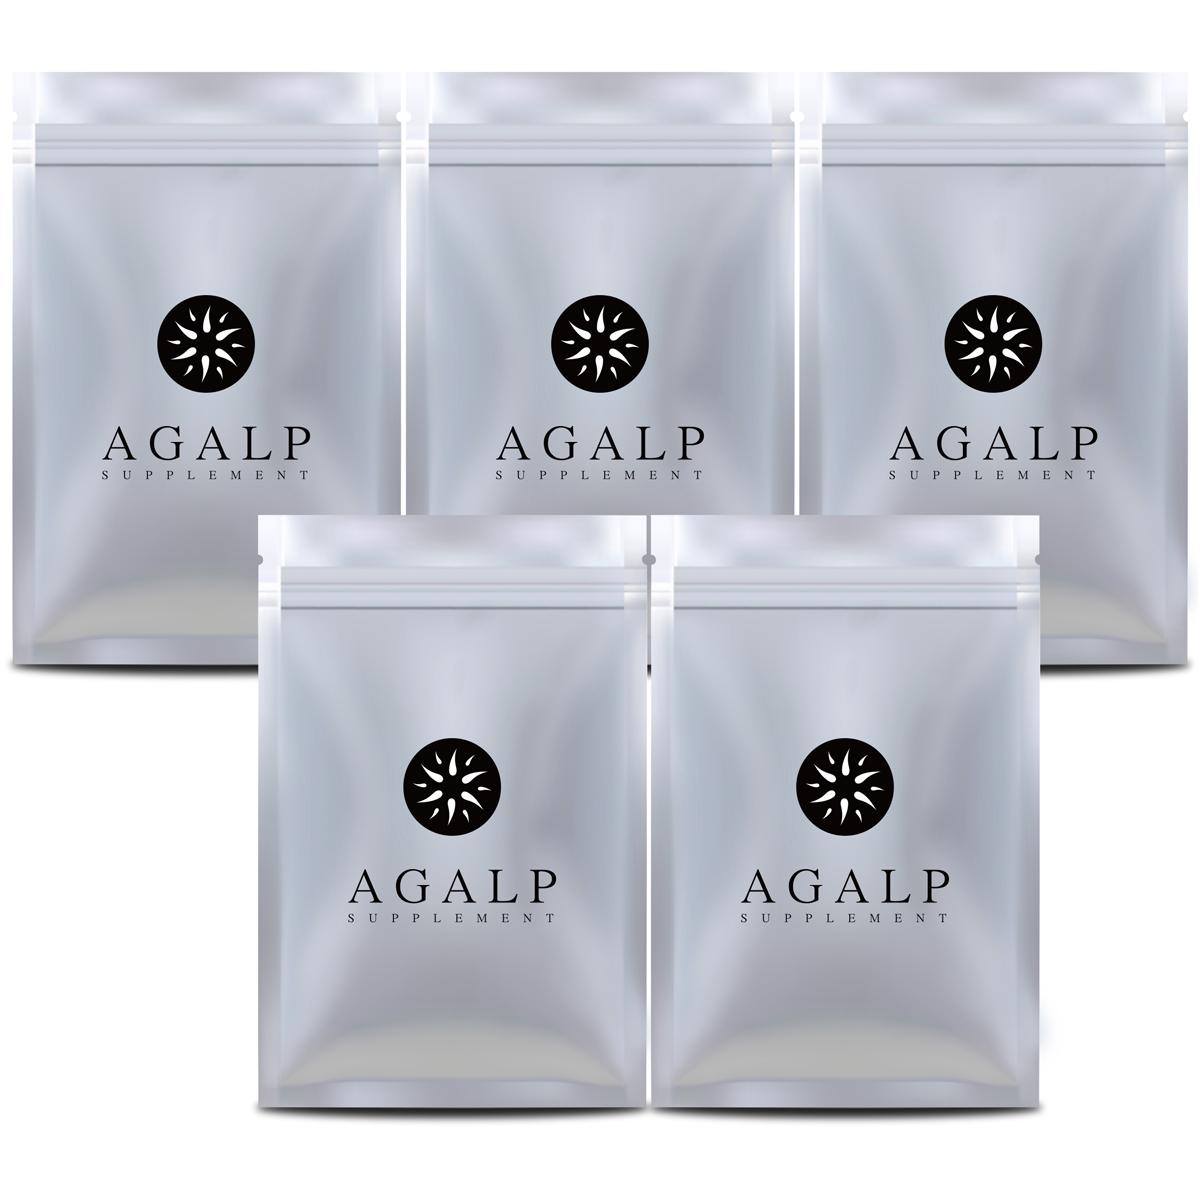 AGALP 育毛 サプリ ノコギリヤシ 亜鉛 育毛 発毛 薄毛 抜け毛 120粒×5袋